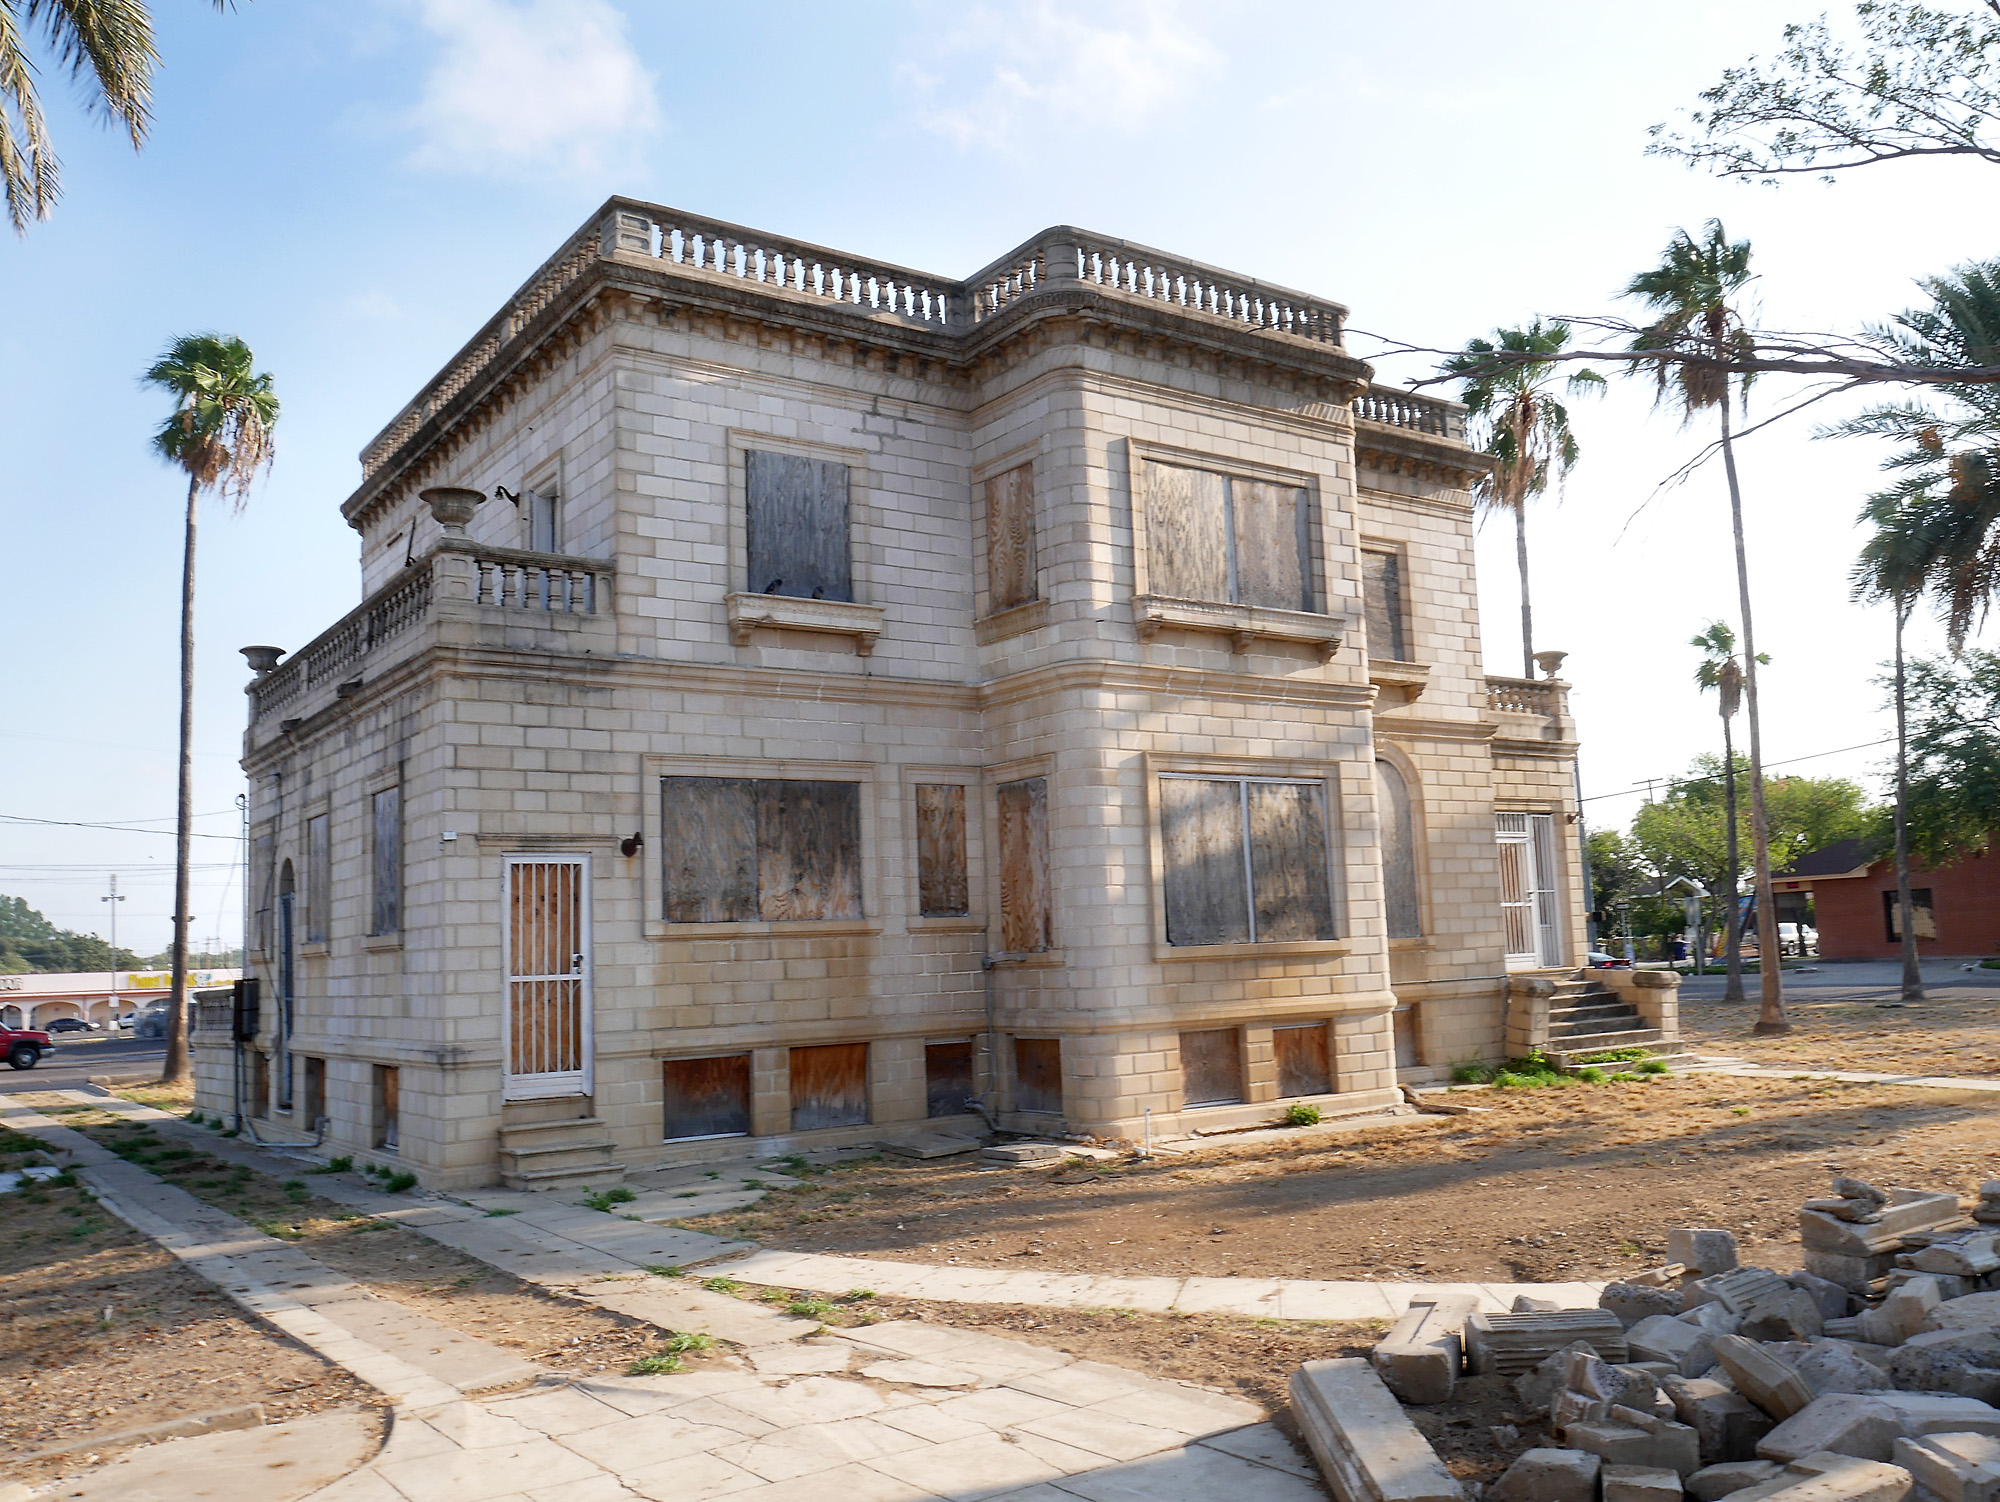 Fullsize Of Rivera Funeral Home